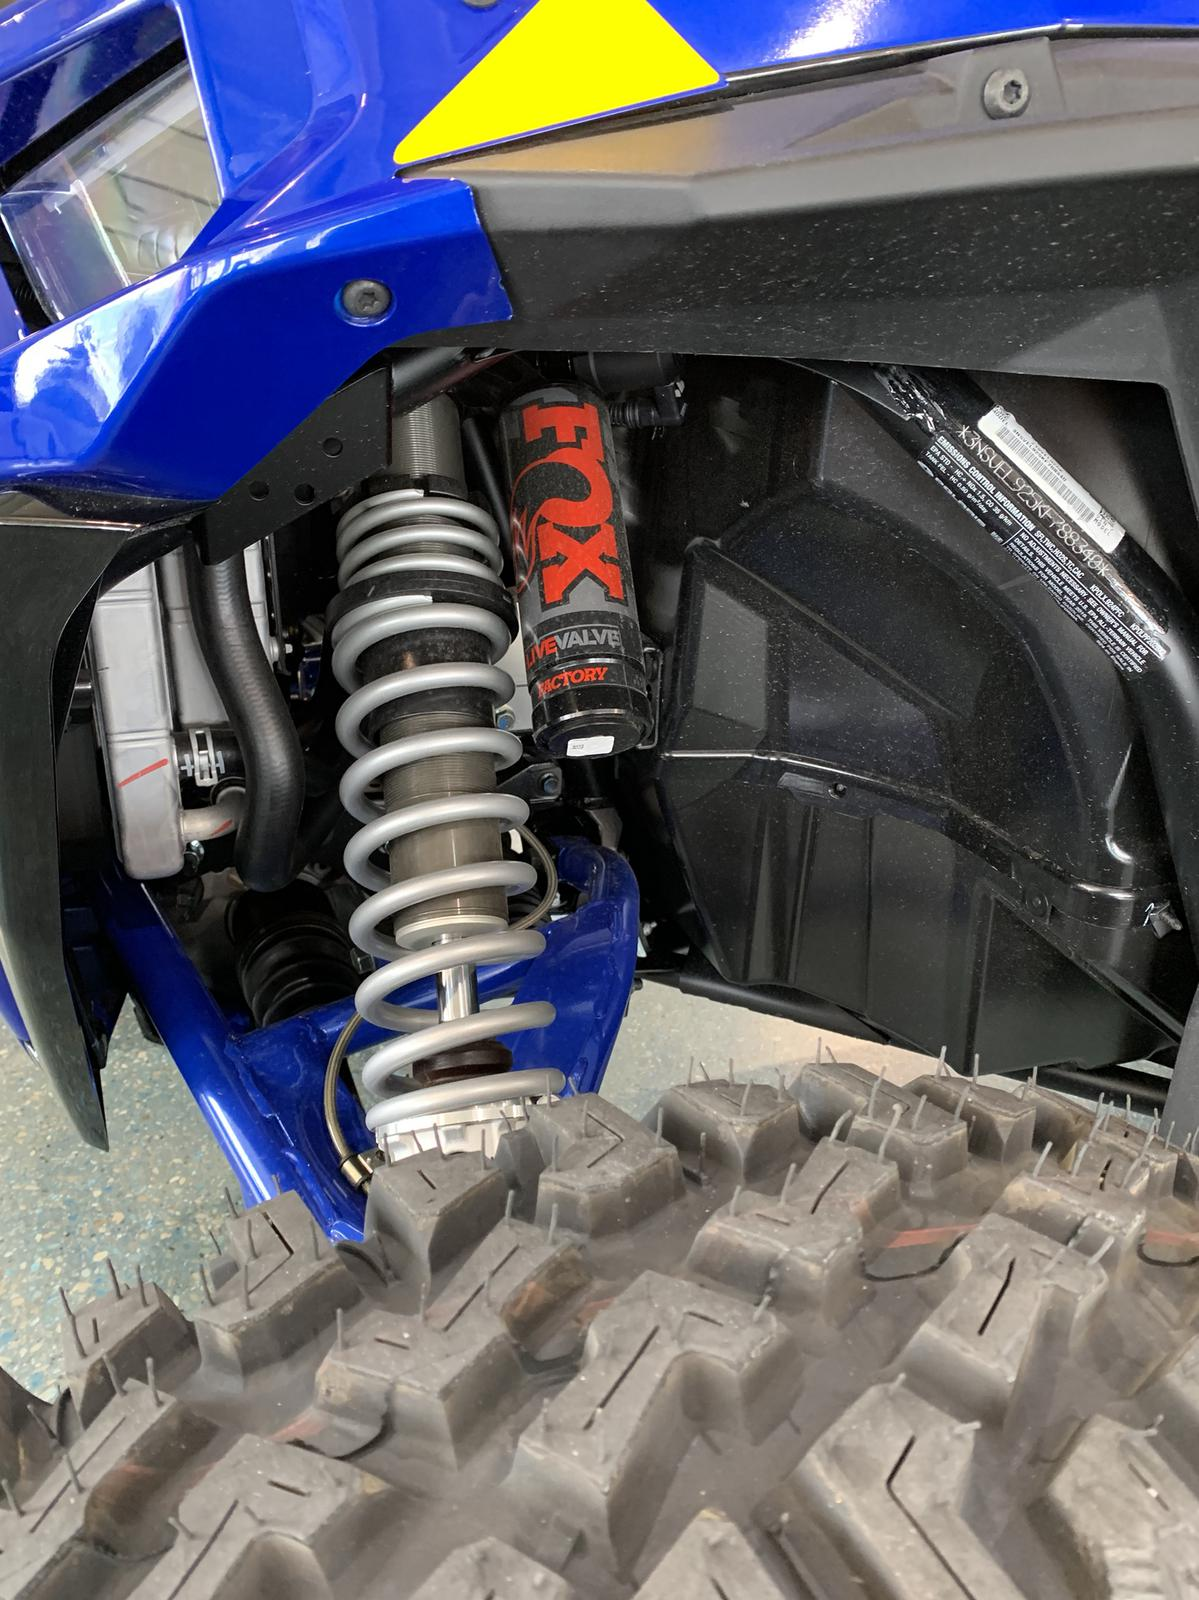 2019 Polaris Industries RZR XP® Turbo S - Polaris Blue